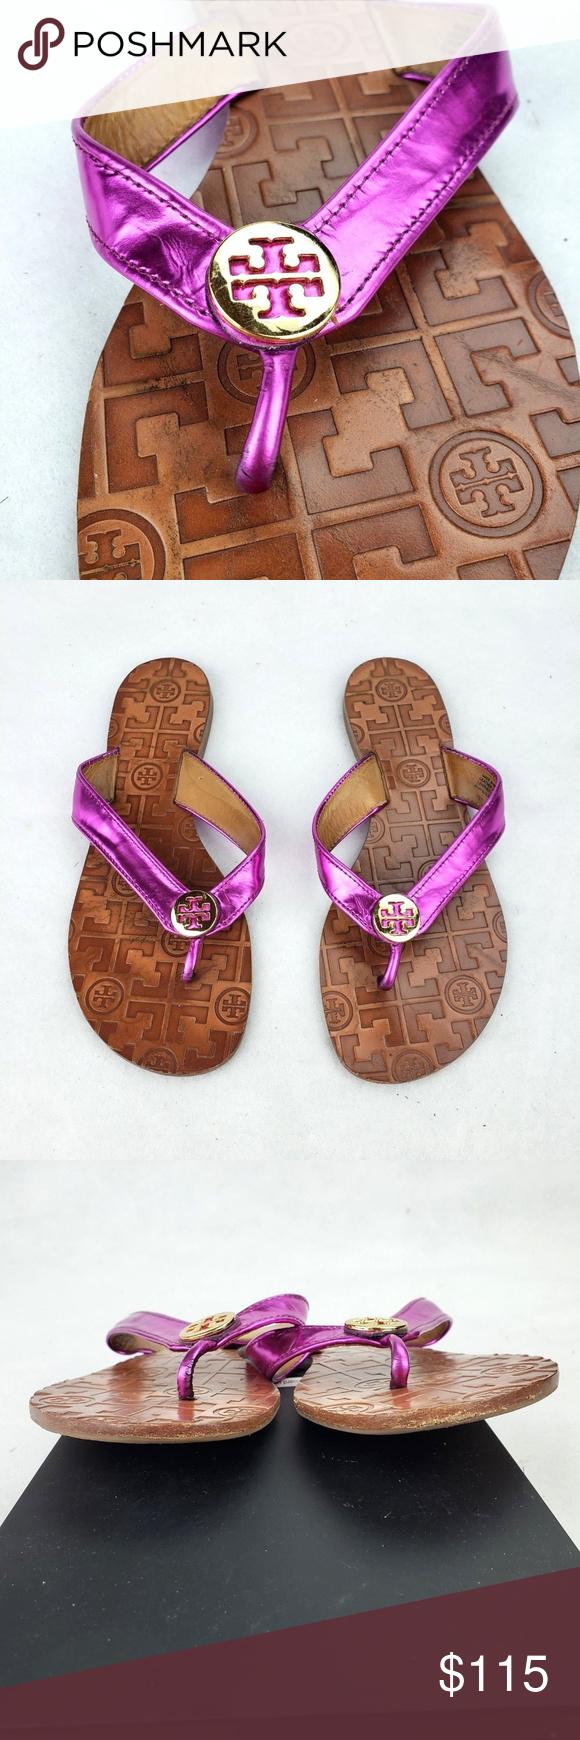 8a41a6623f56 Tory Burch Sandals Purple Shiny Thora Size 7 Tory Burch Thora Sandals Flip  Flops Shiny Purple